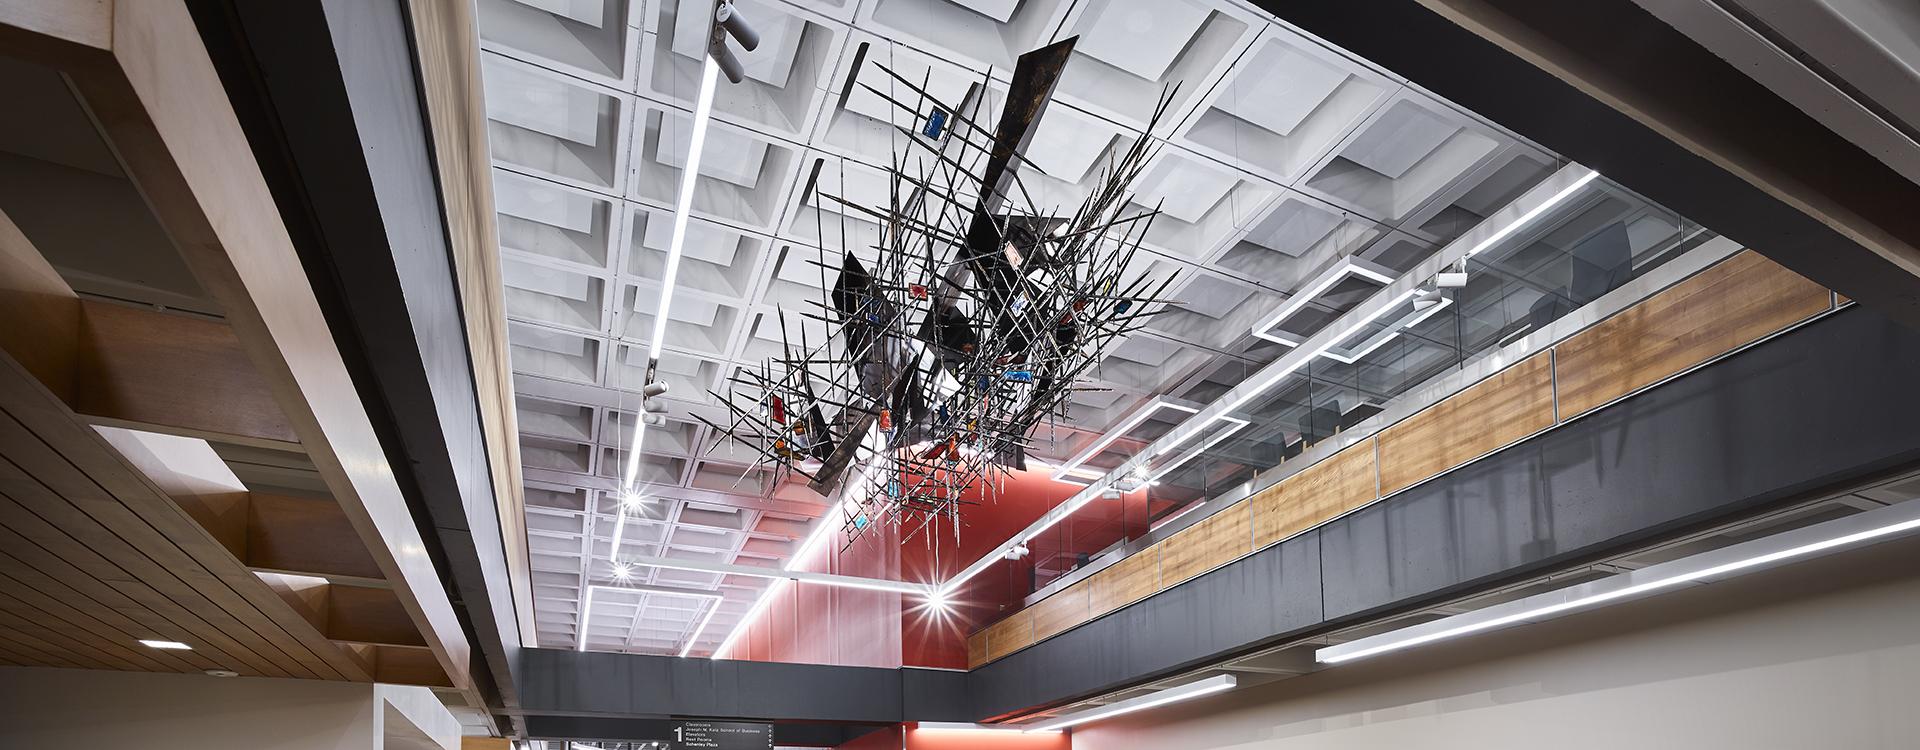 Coronet lighting in Posvar Hall, University of Pittsburgh